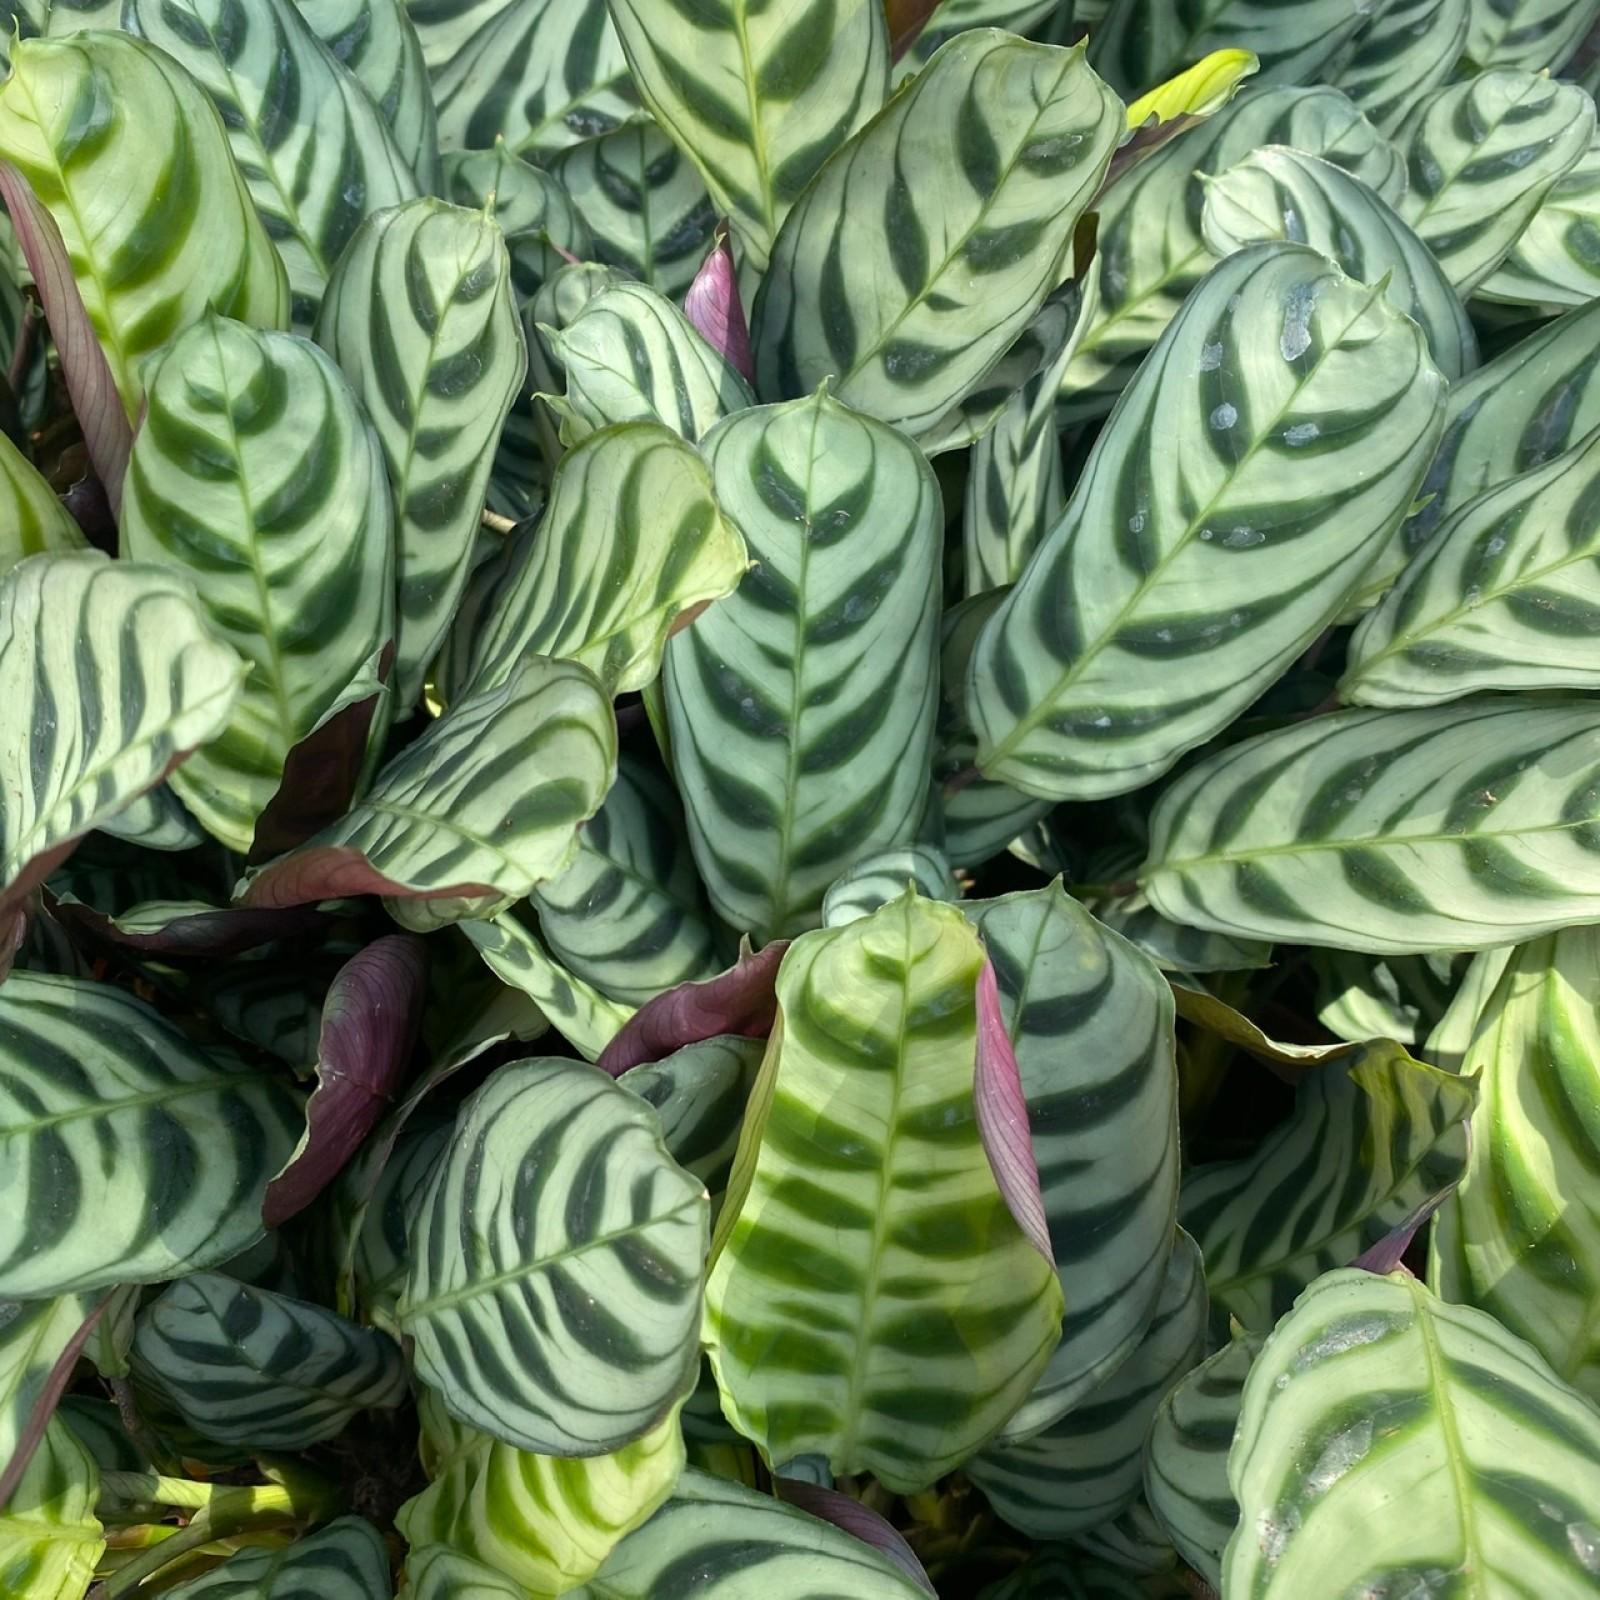 Ctenanthe Burle Marxii Fishbone Prayer Plant Never Never Plant Houseplants Delivered To London Walworth Garden